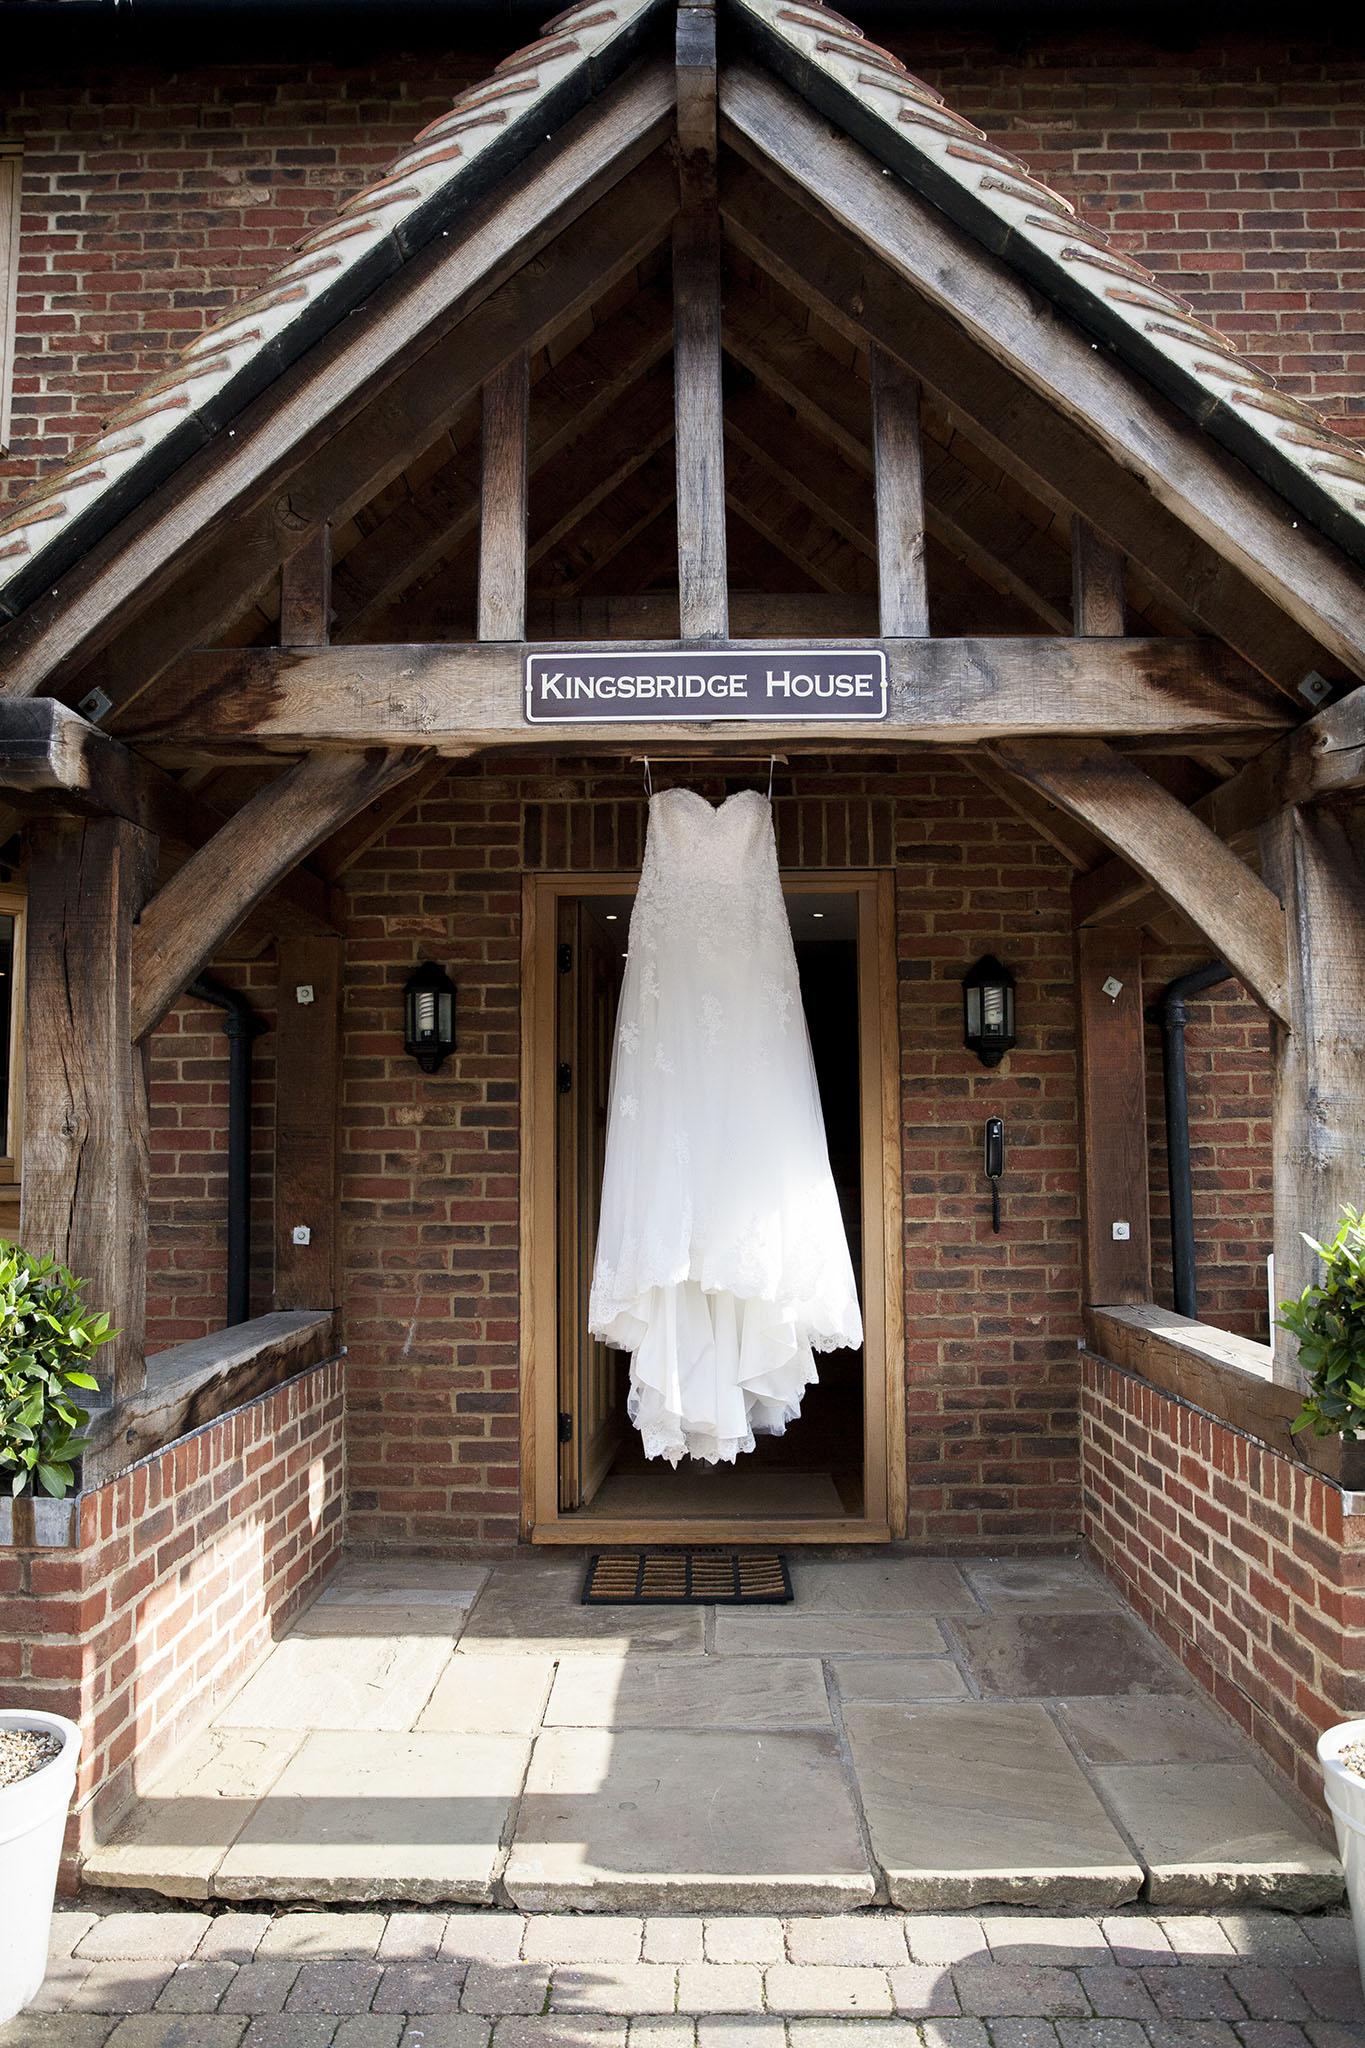 elizabethgphotography_kingslangley_hertfordshire_fineart_wedding_tewinbury_farm_tayna_01.jpg